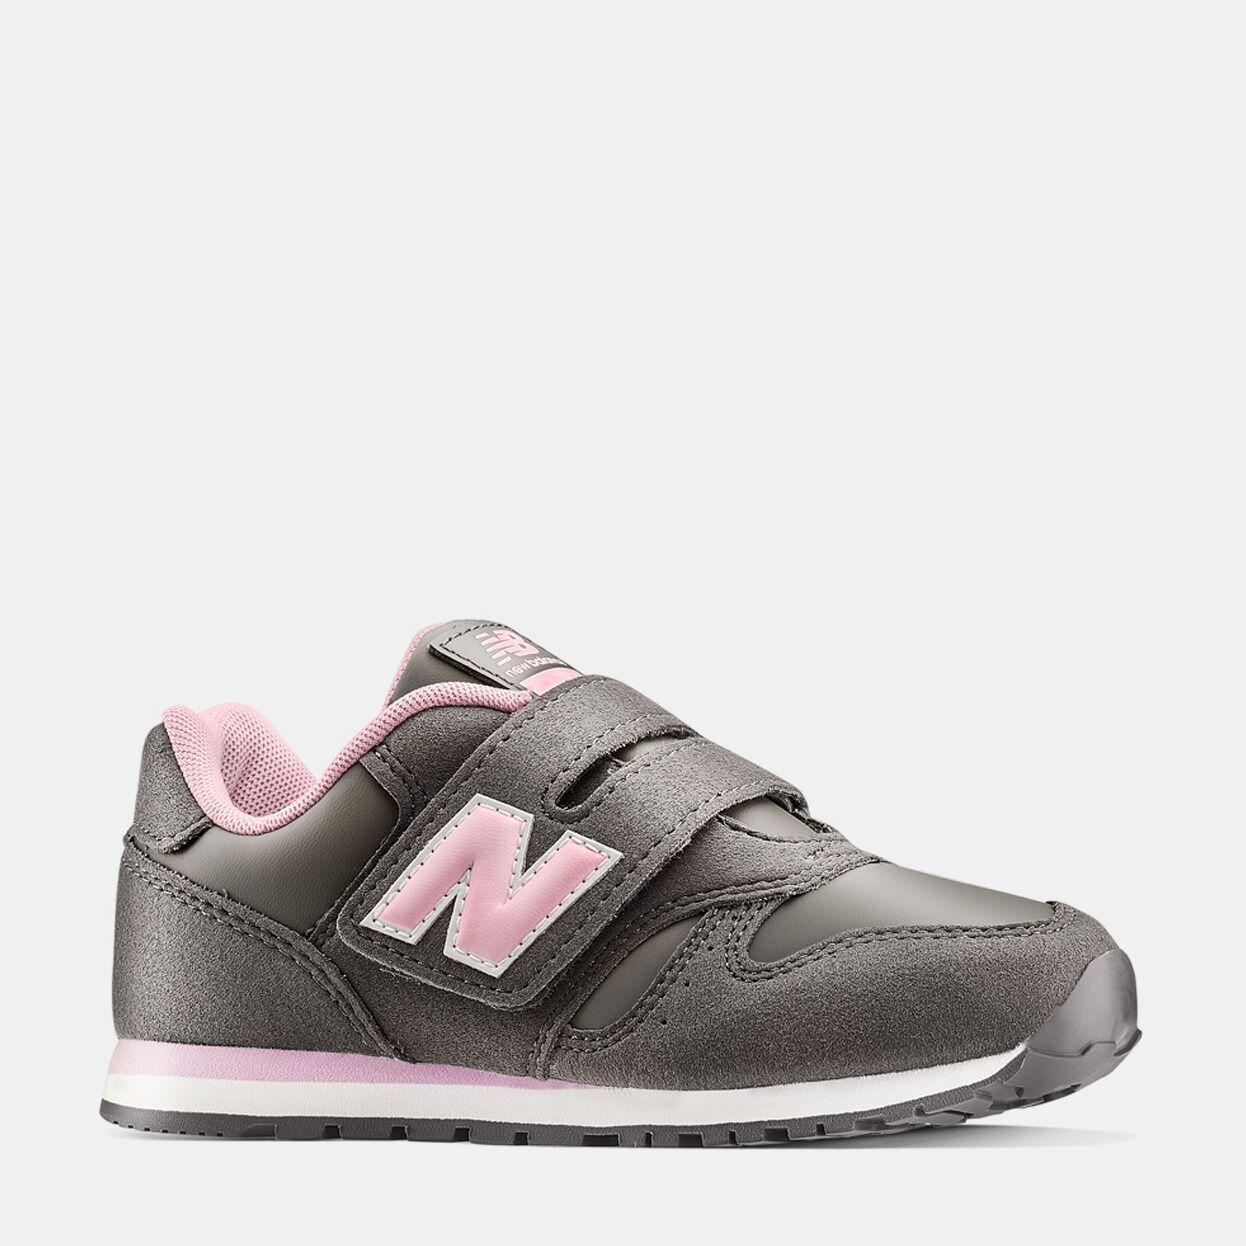 scarpe new balance bambini primavera estate